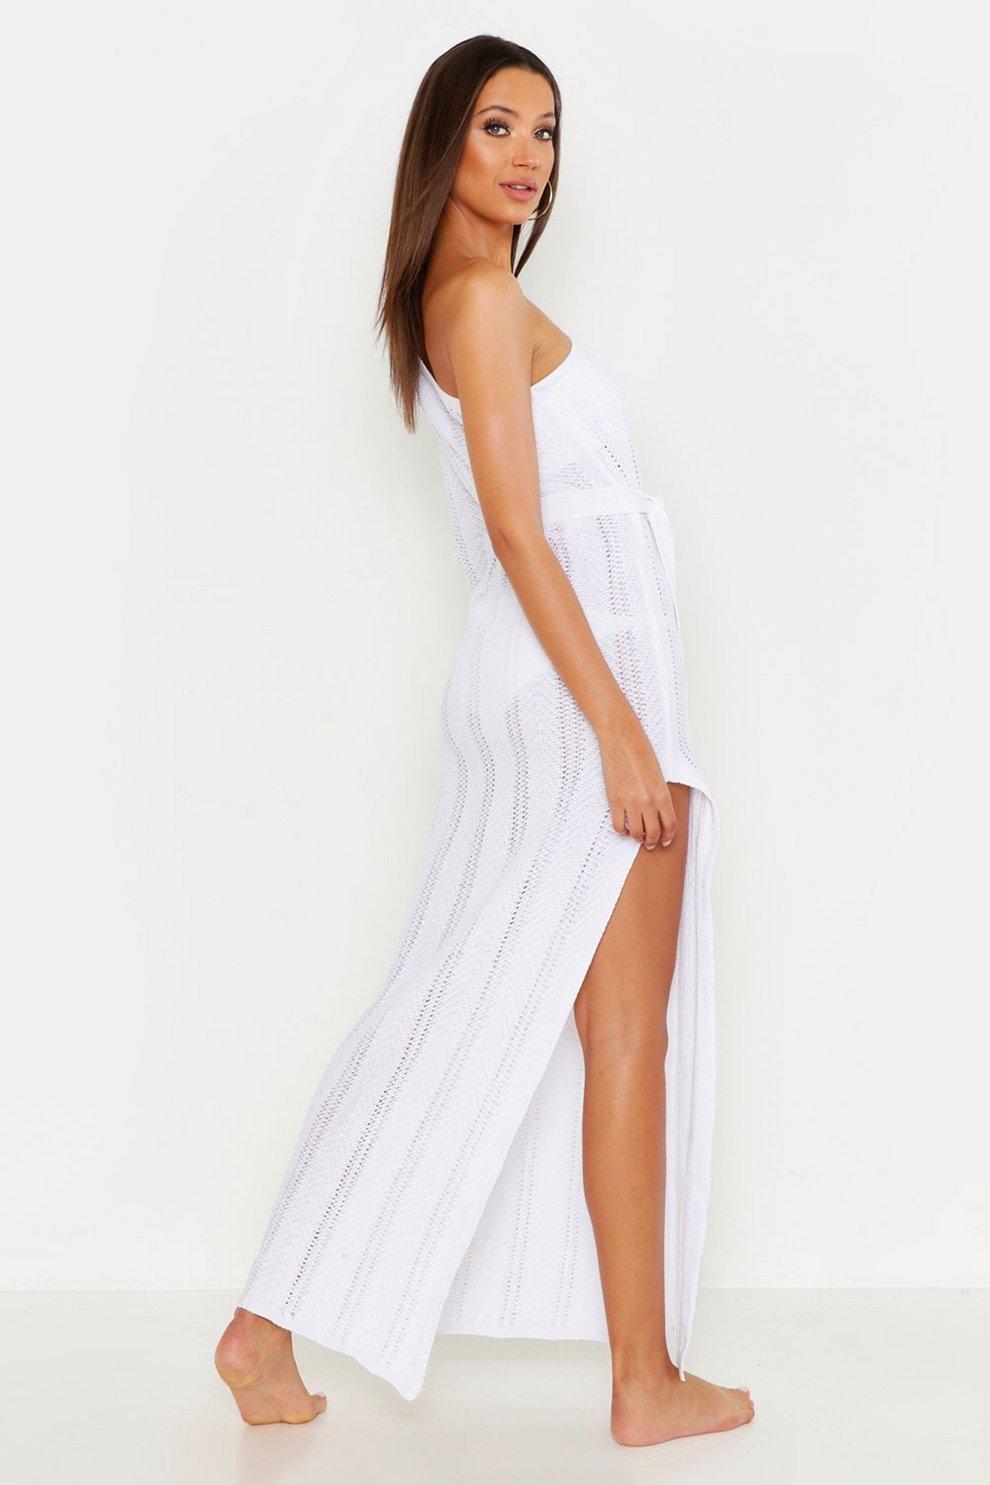 ac10fcf357e5 Tall One Shoulder Knitted Beach Dress | Boohoo